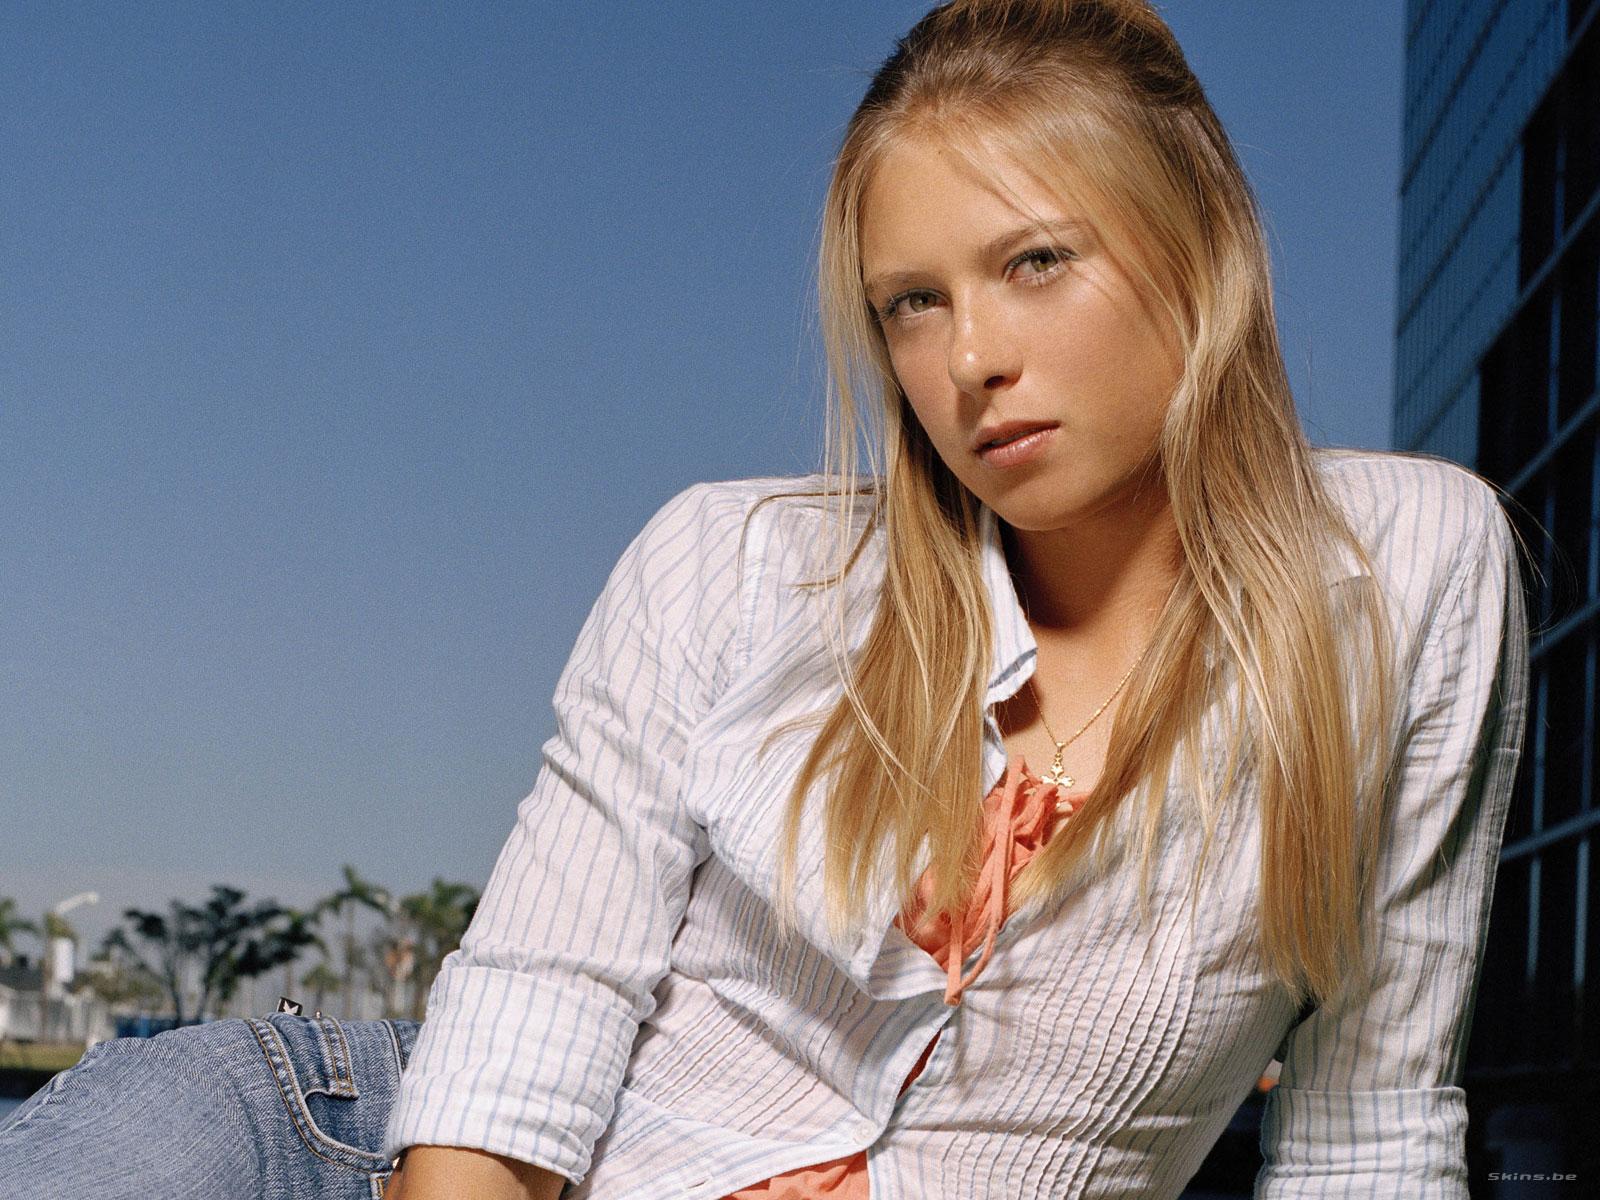 http://1.bp.blogspot.com/-4_InhpjVO-I/TZgdwJVHBhI/AAAAAAAABIw/zwIXARaEvUI/s1600/Maria+Sharapova+%25284%2529.jpg